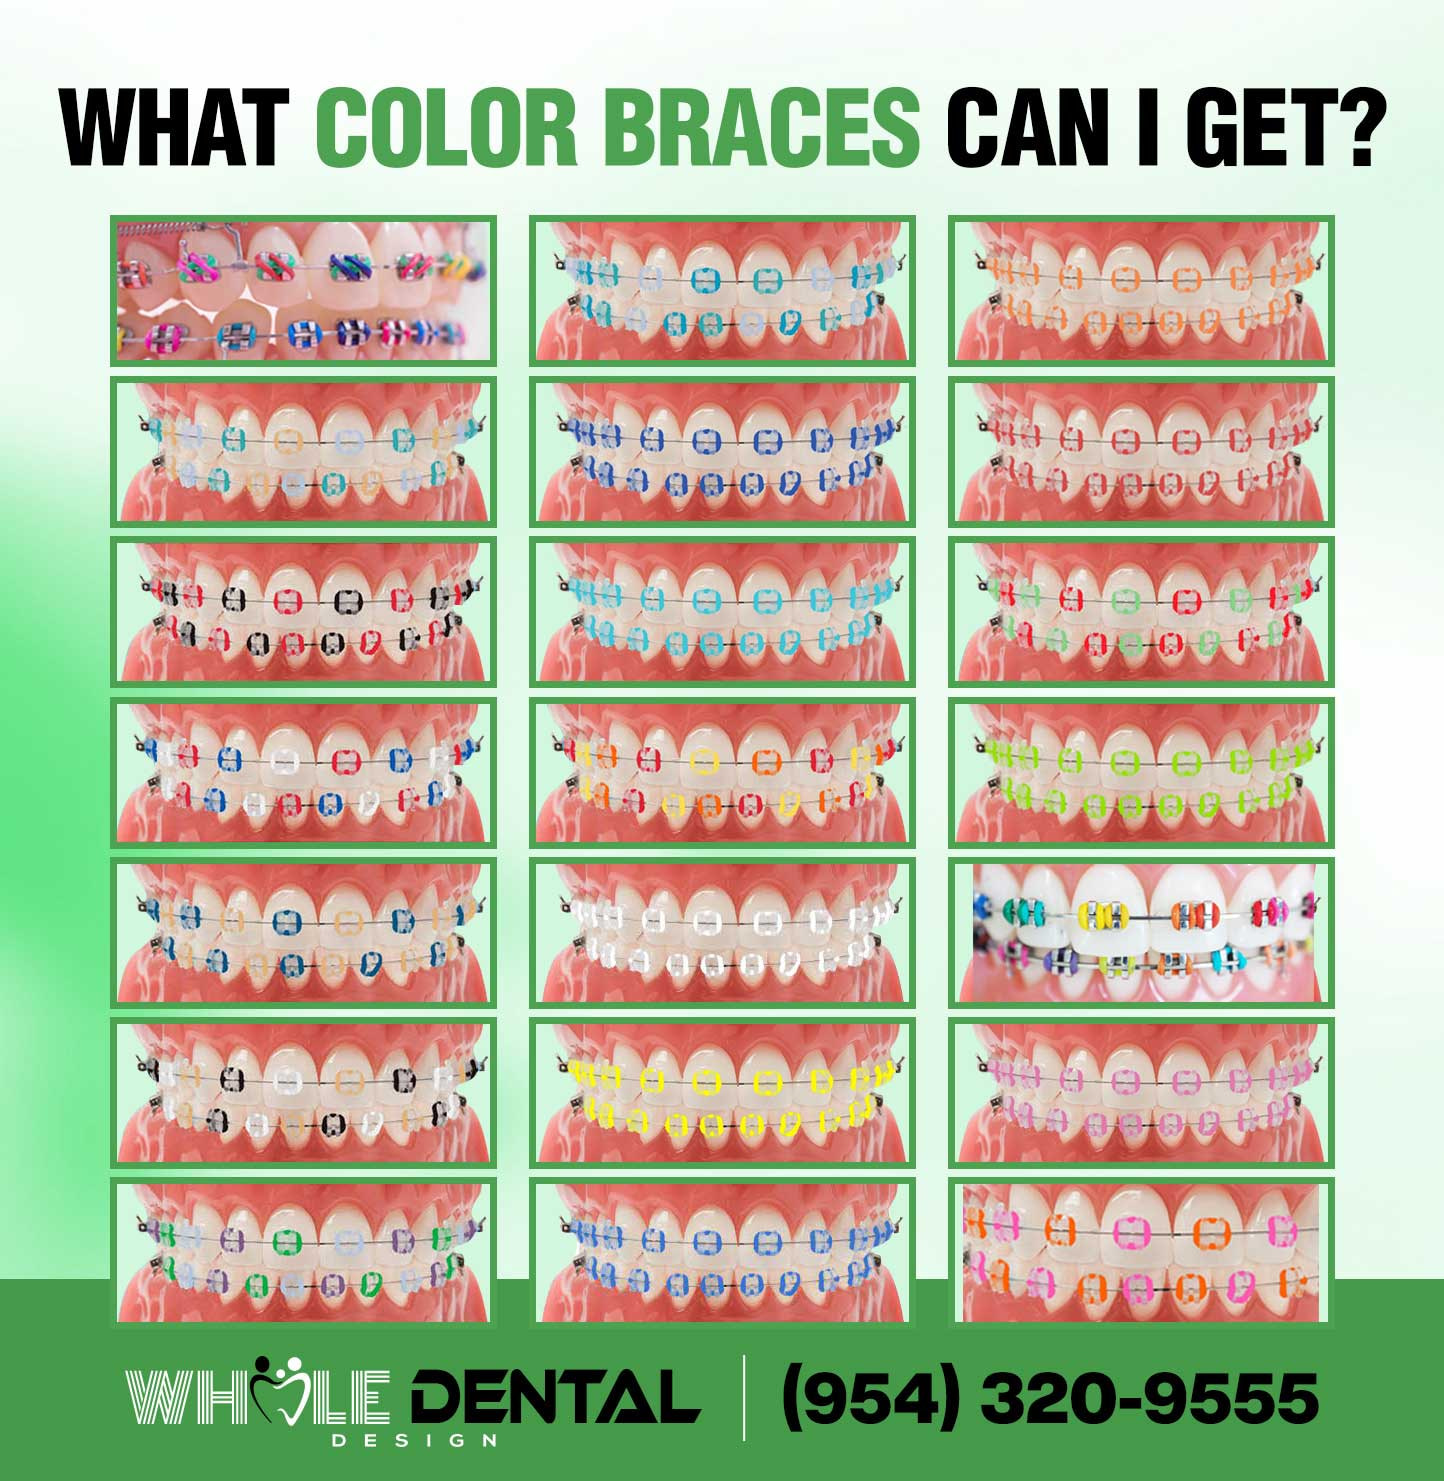 Dental-Braces-HD-Image2